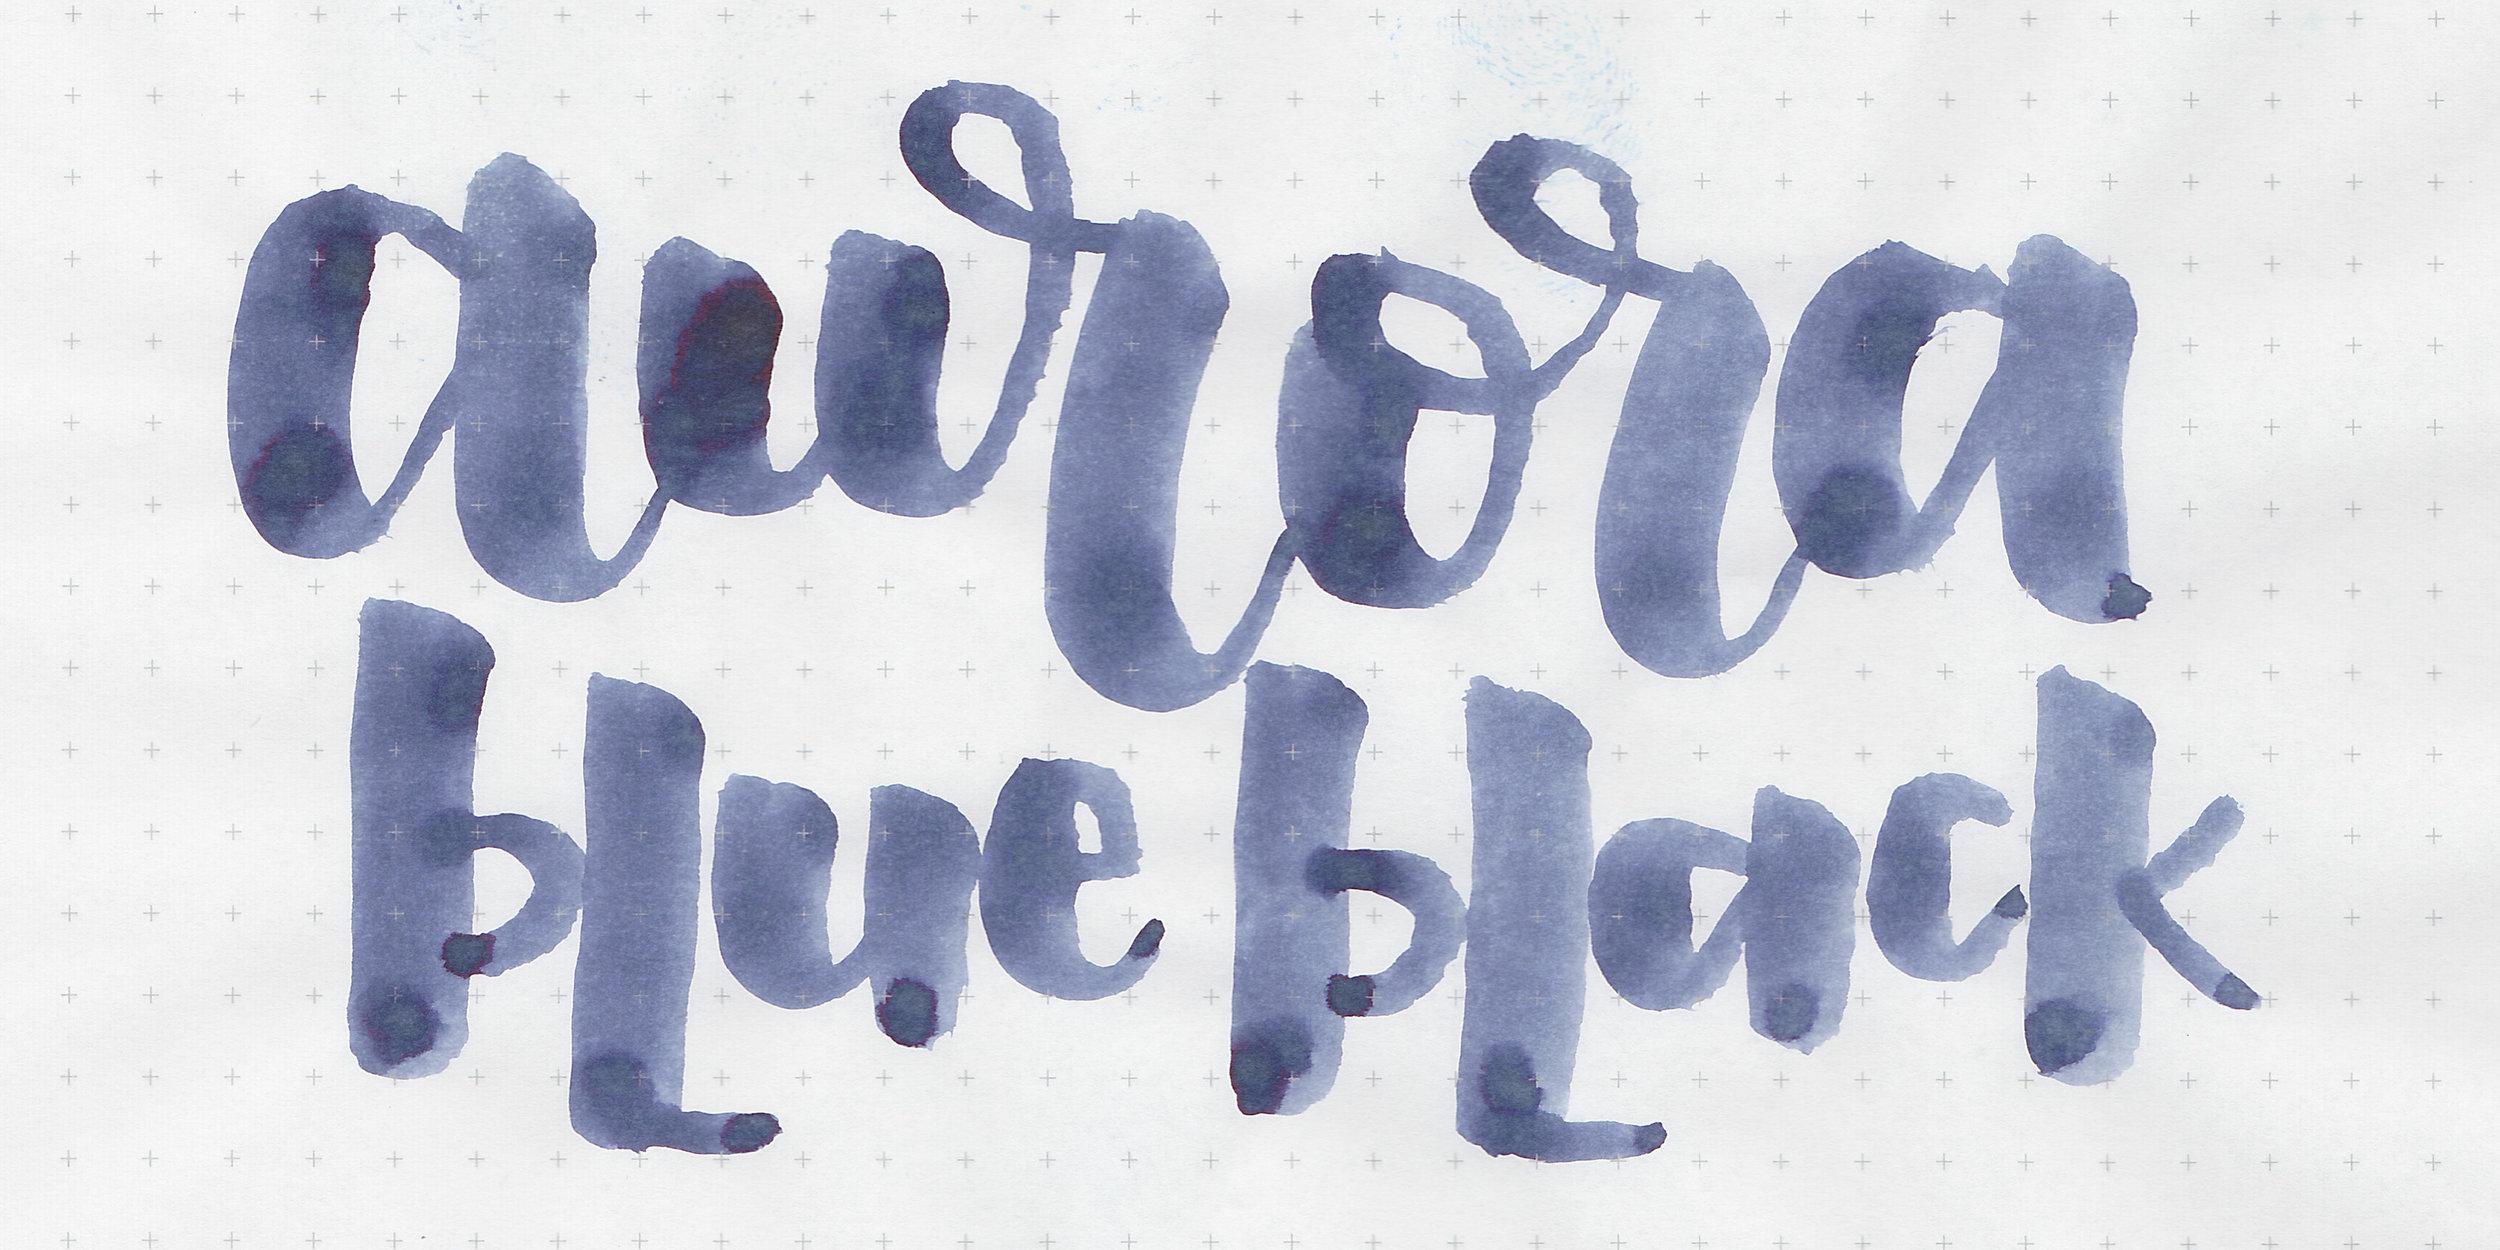 ar-blue-black-4.jpg